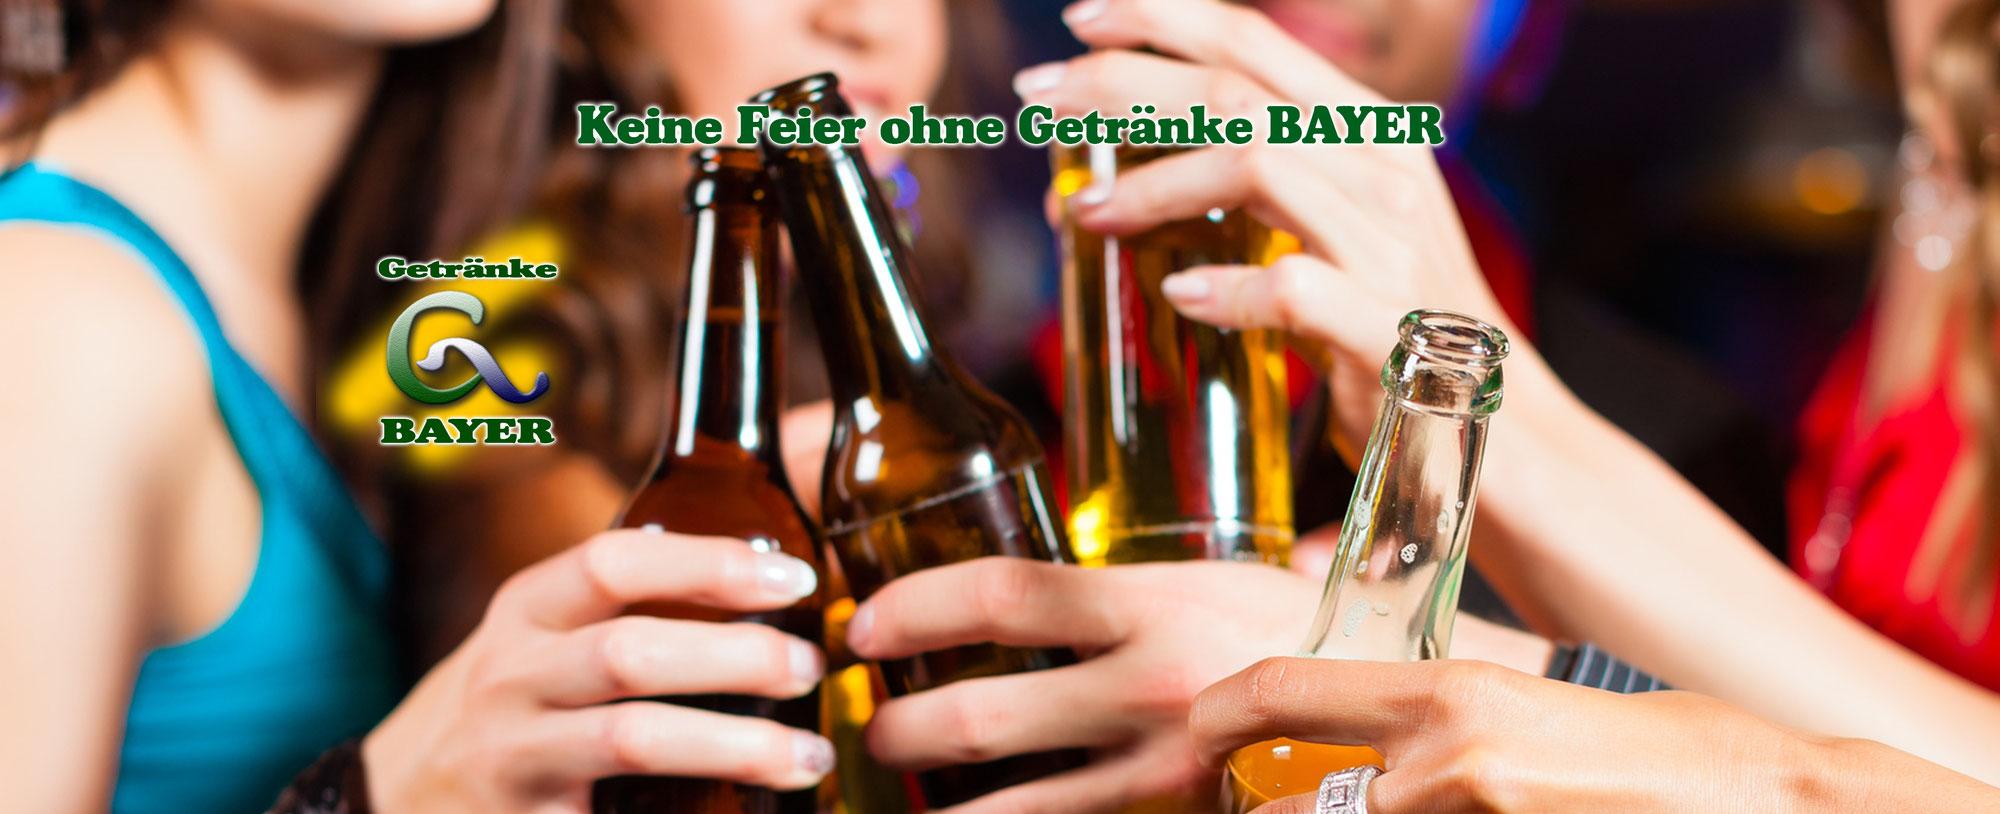 Bierrekorde - Getränke Bayer Königsbrunn am Wagram